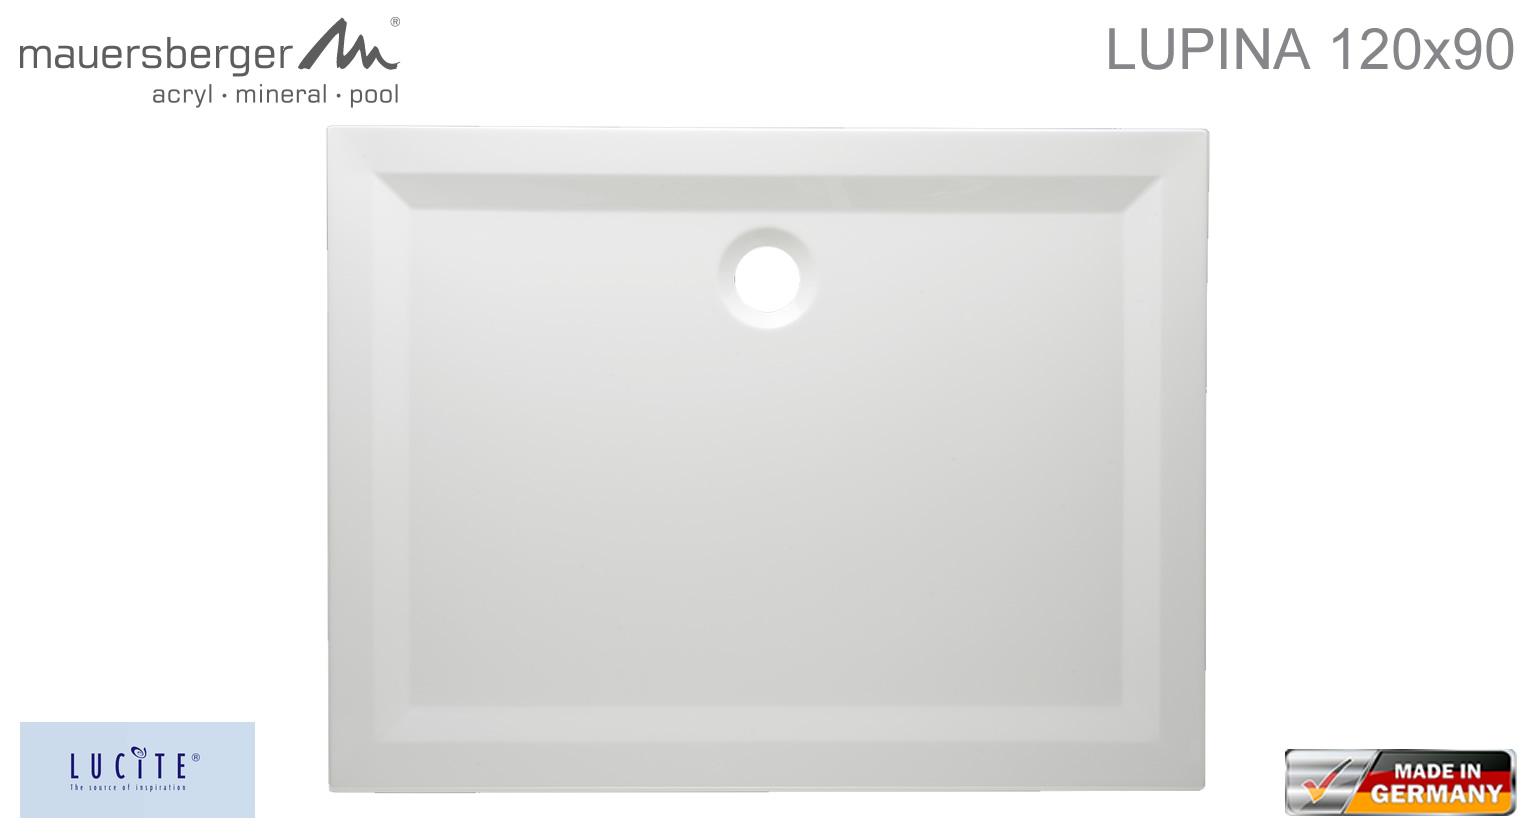 mauersberger duschwanne lupina 120 x 90 cm superflach impulsbad. Black Bedroom Furniture Sets. Home Design Ideas